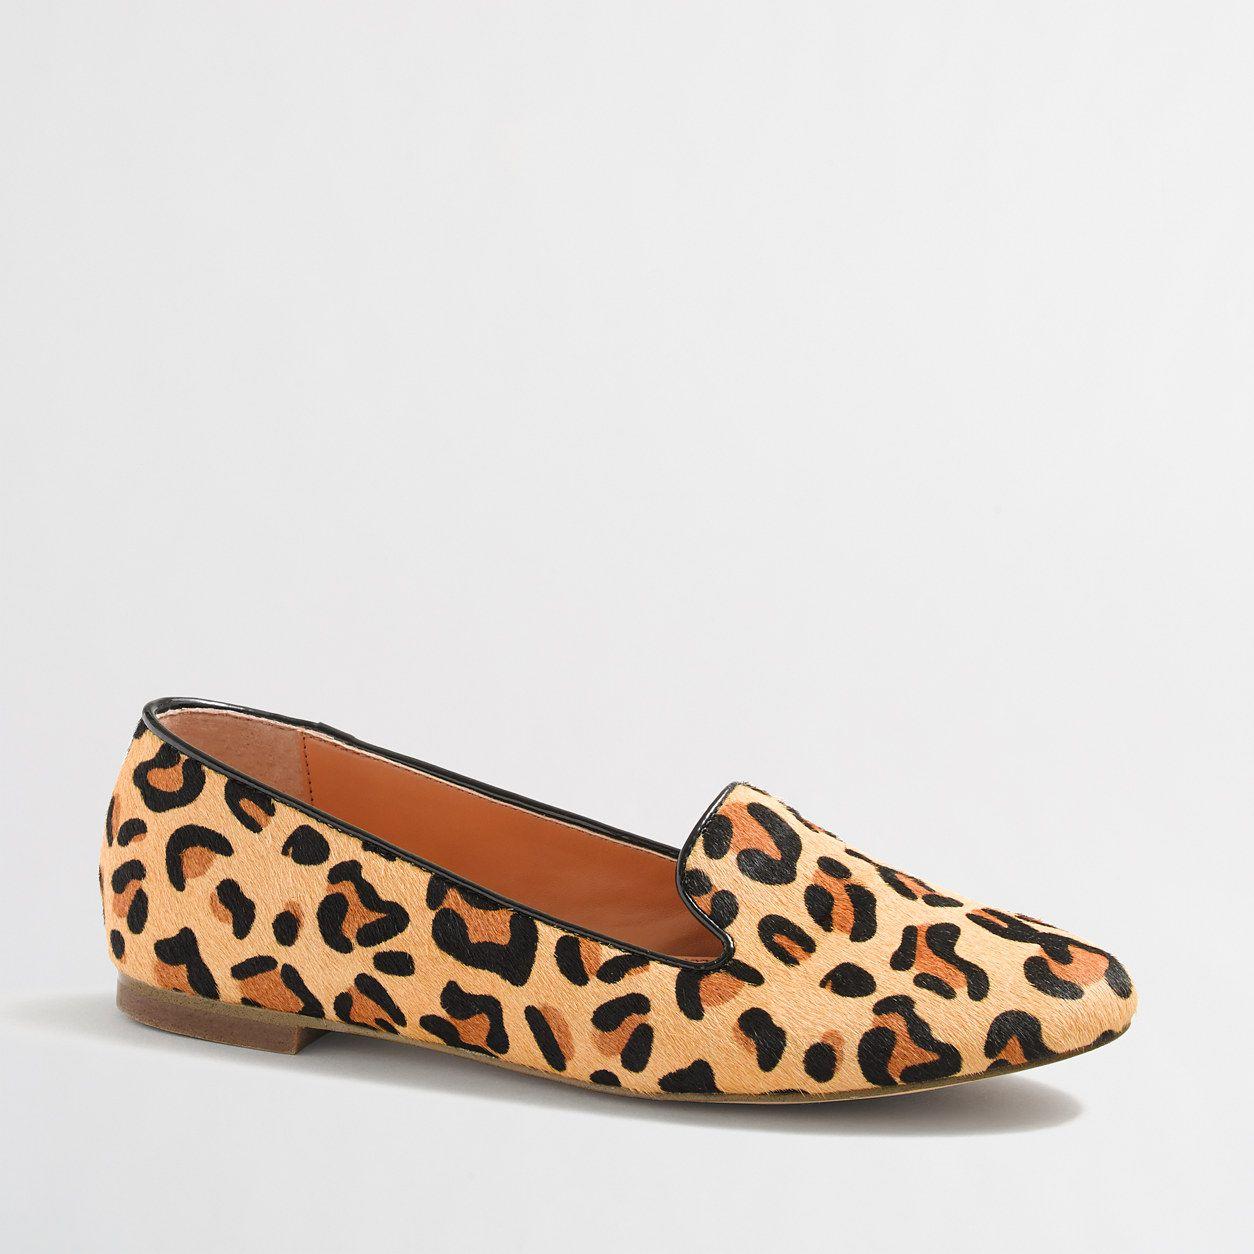 j crew animal print shoes